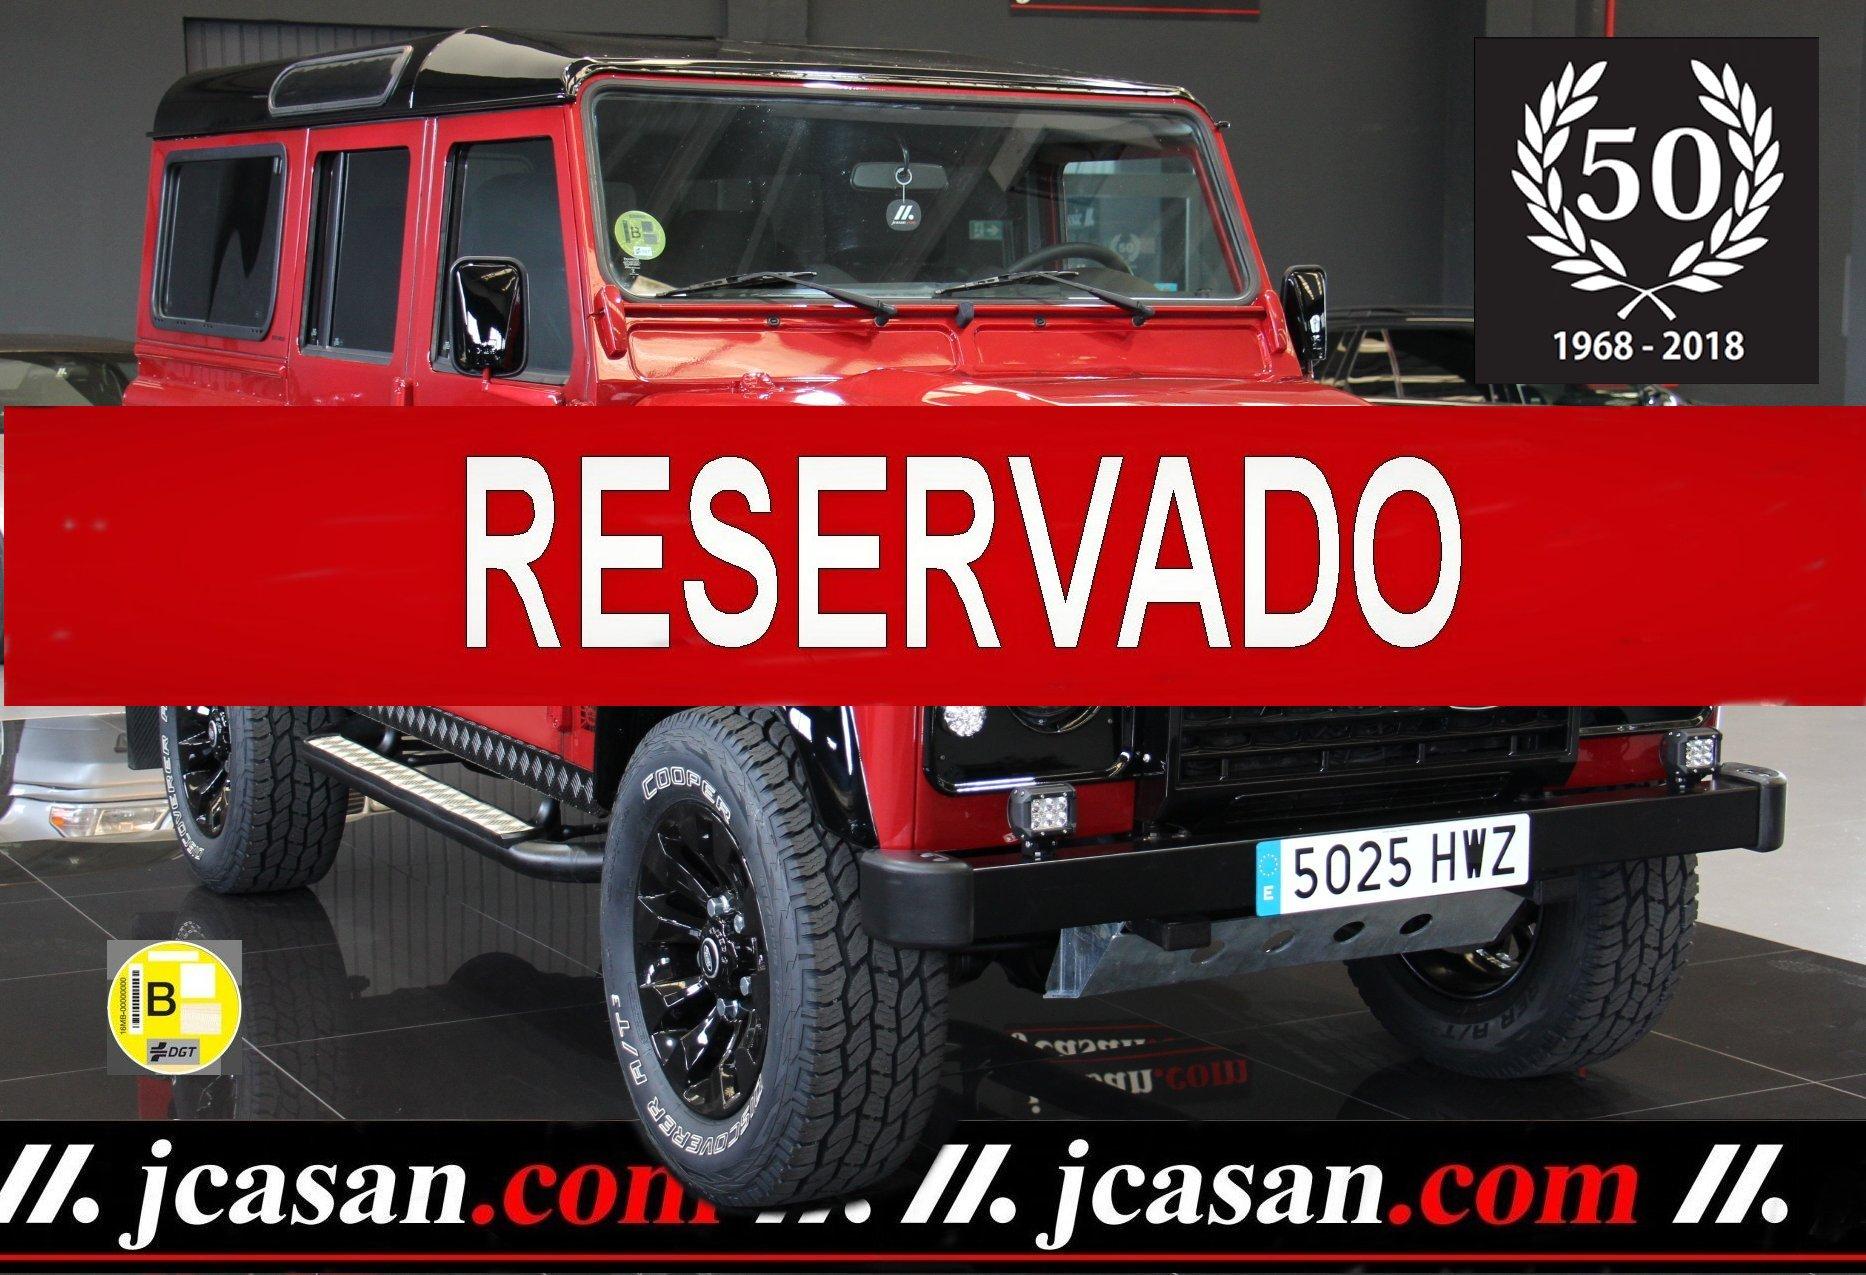 LAND ROVER DEFENDER 110 2.2 122 CV 6 Vel  ref 5025